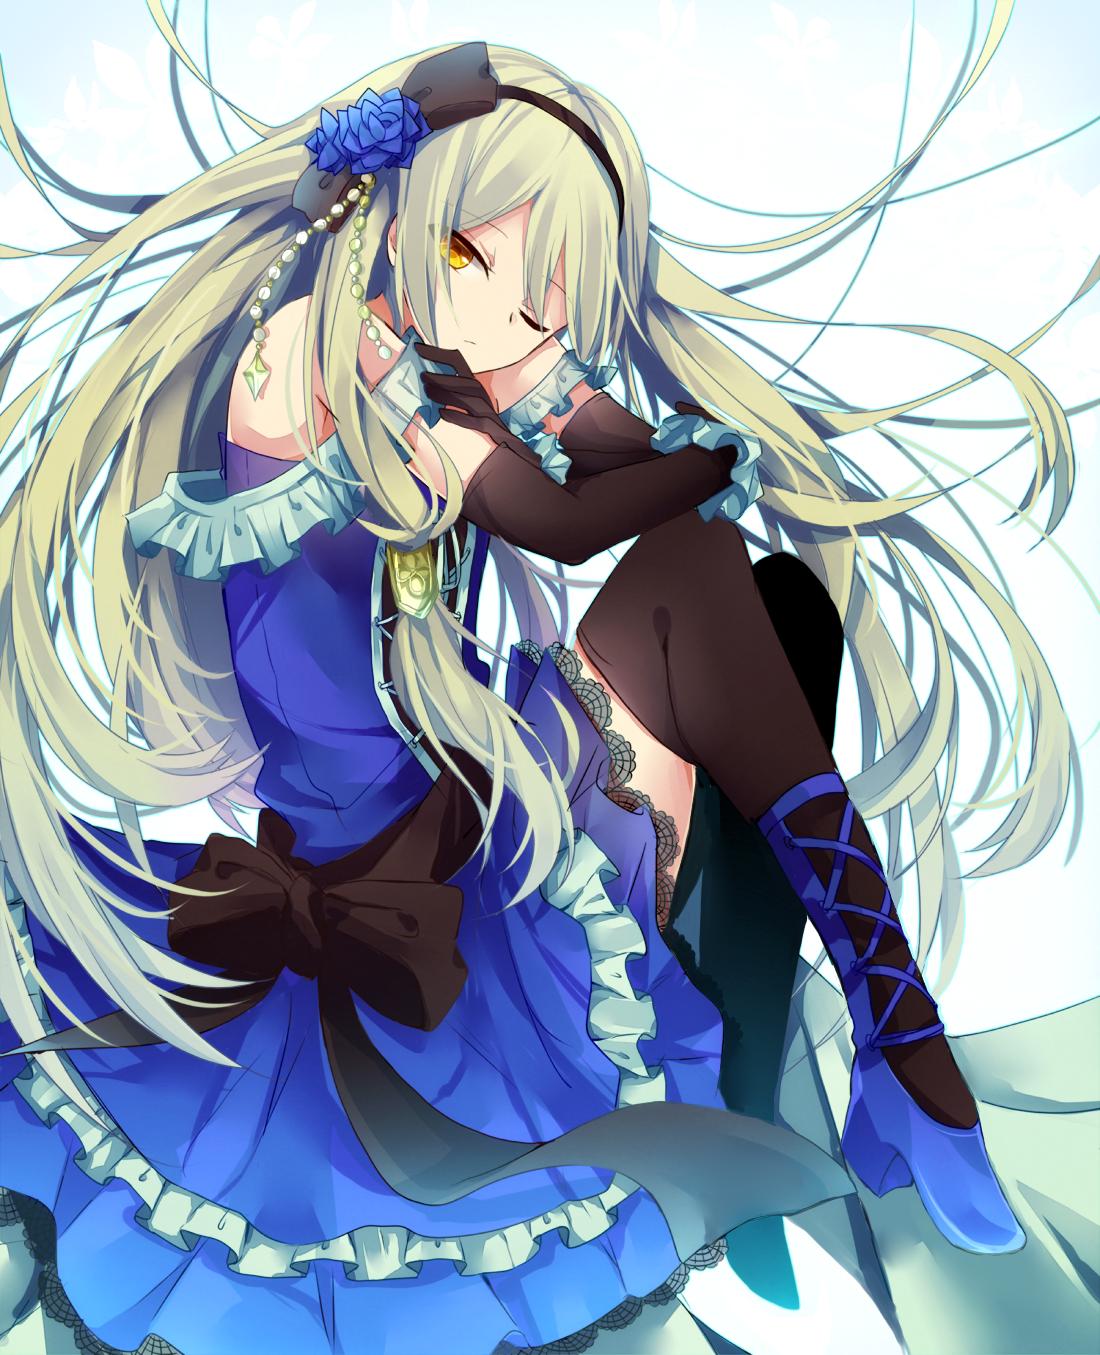 Dress Hiiragisouren Thighhighs Anime Anime Characters Kawaii Anime